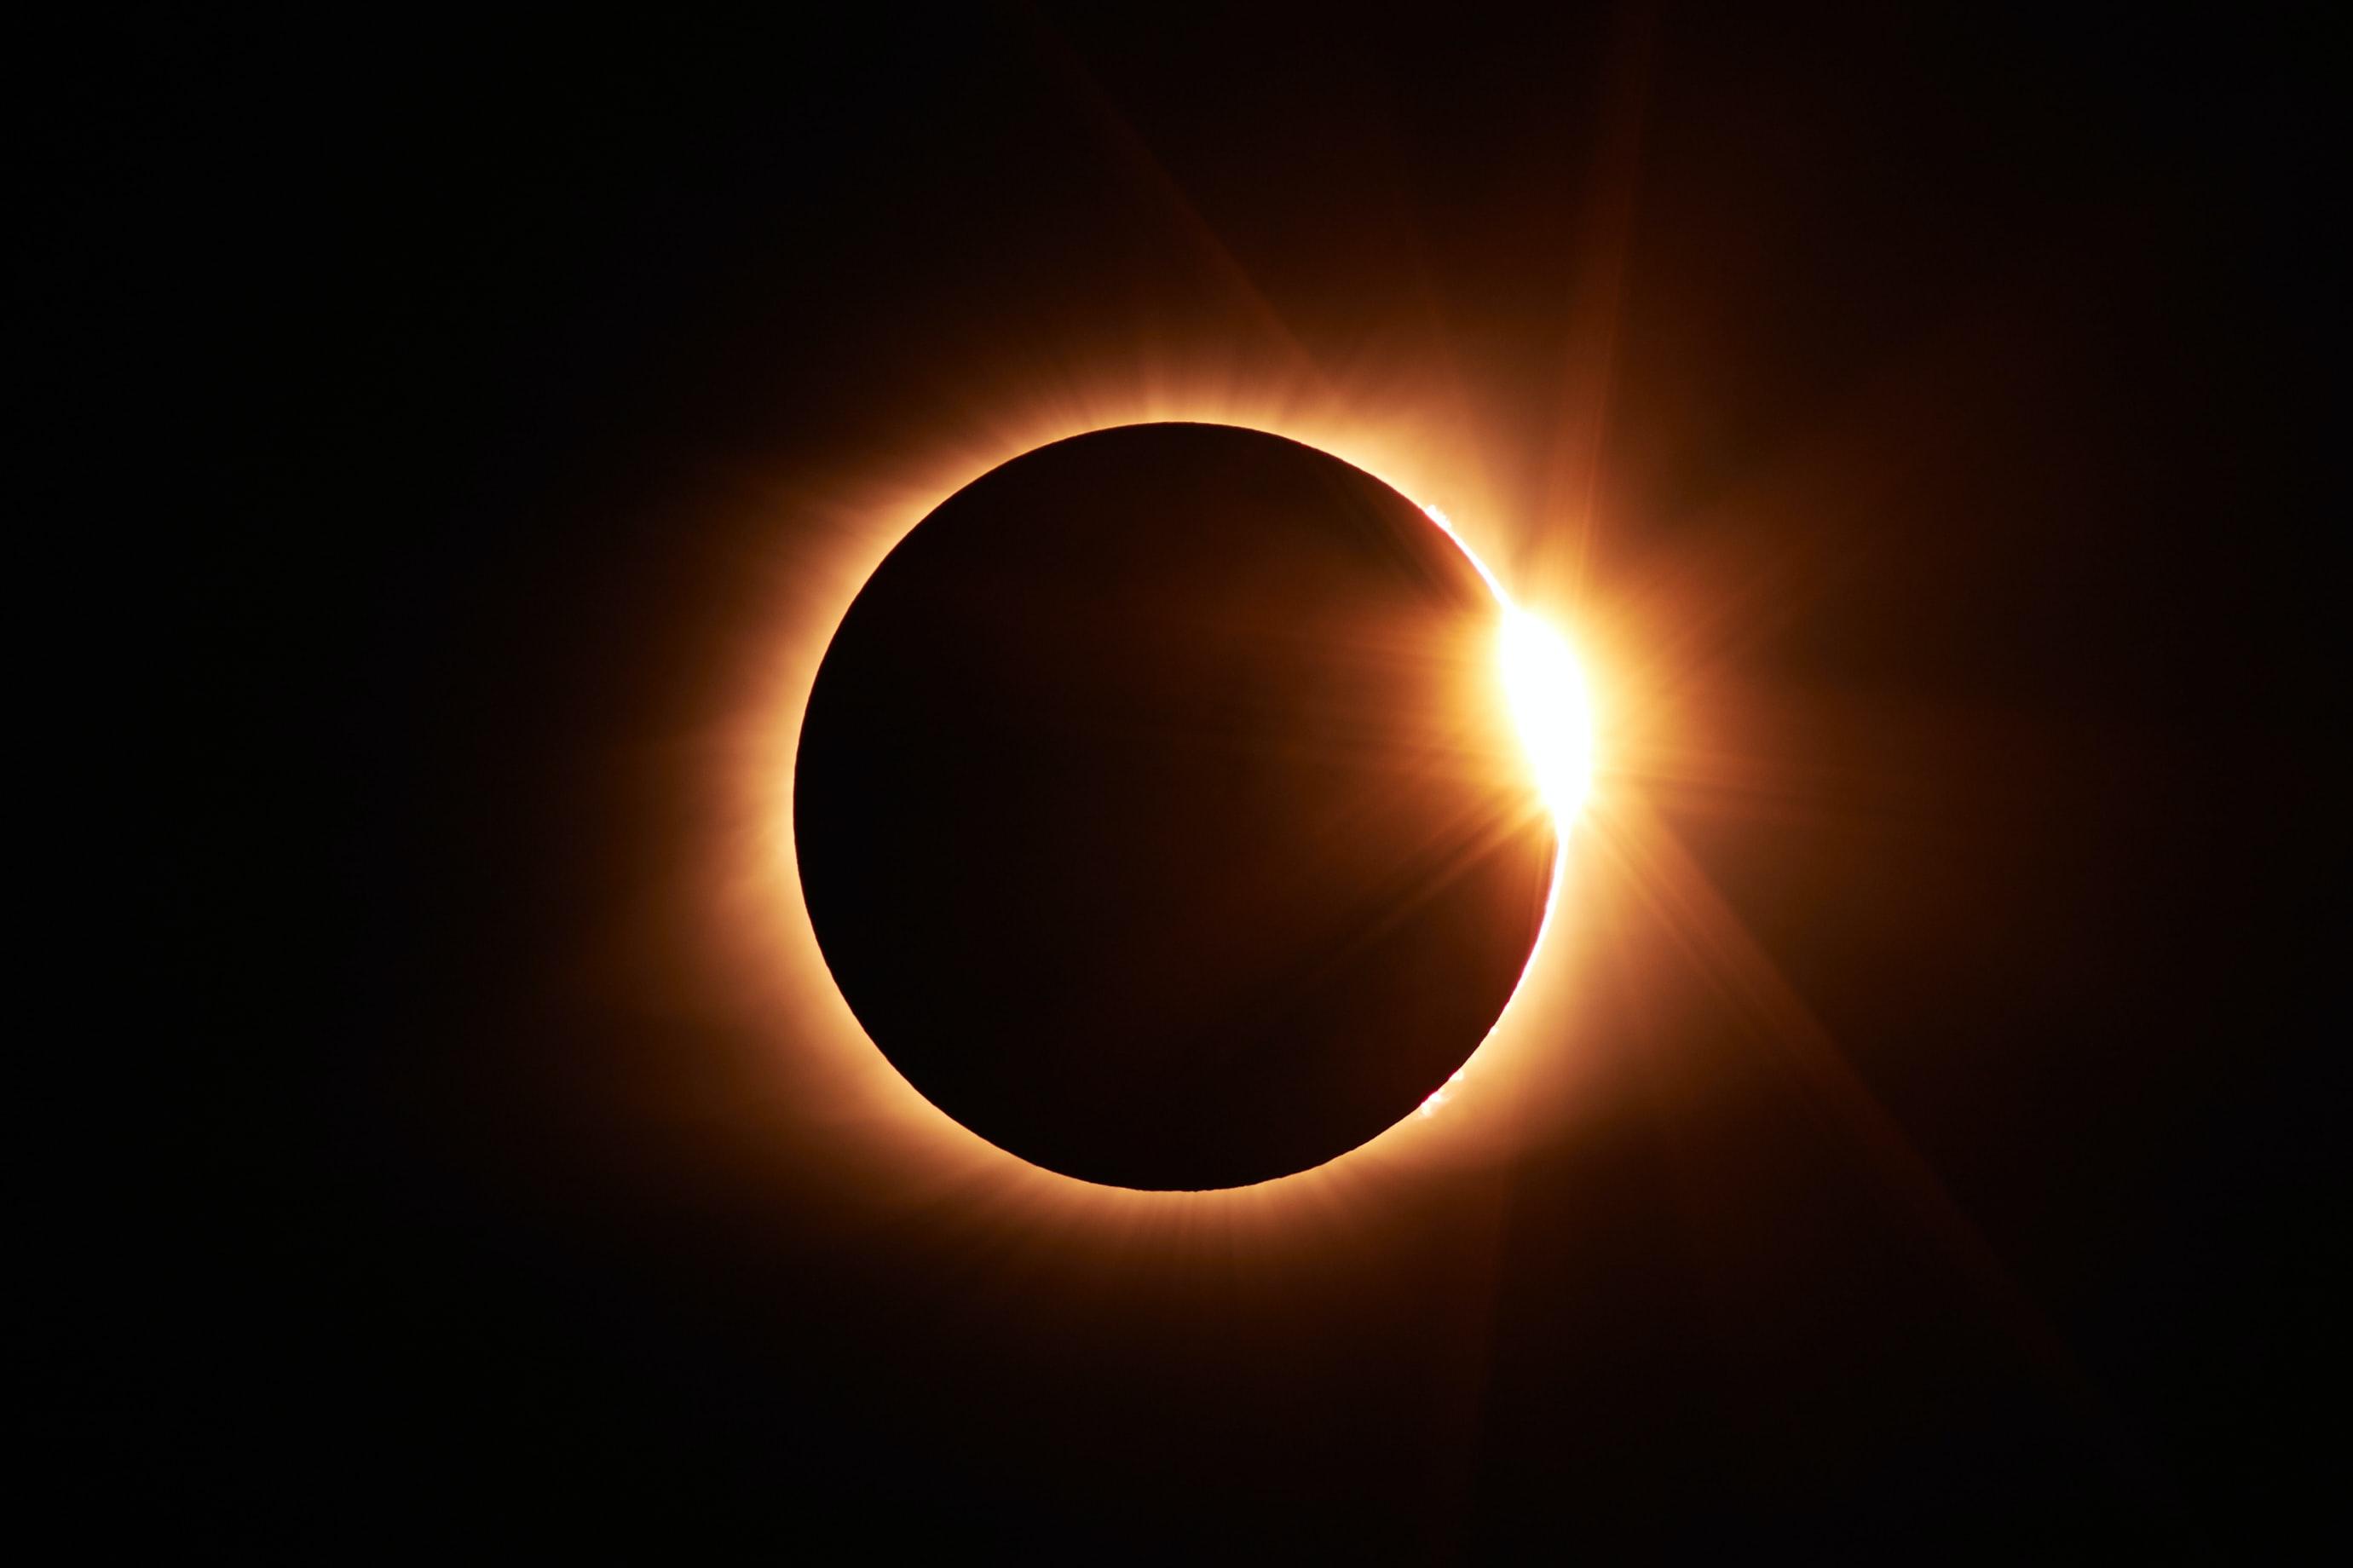 Eclipse Anel de Fogo. Crédito: Jongsun Lee via Unsplash